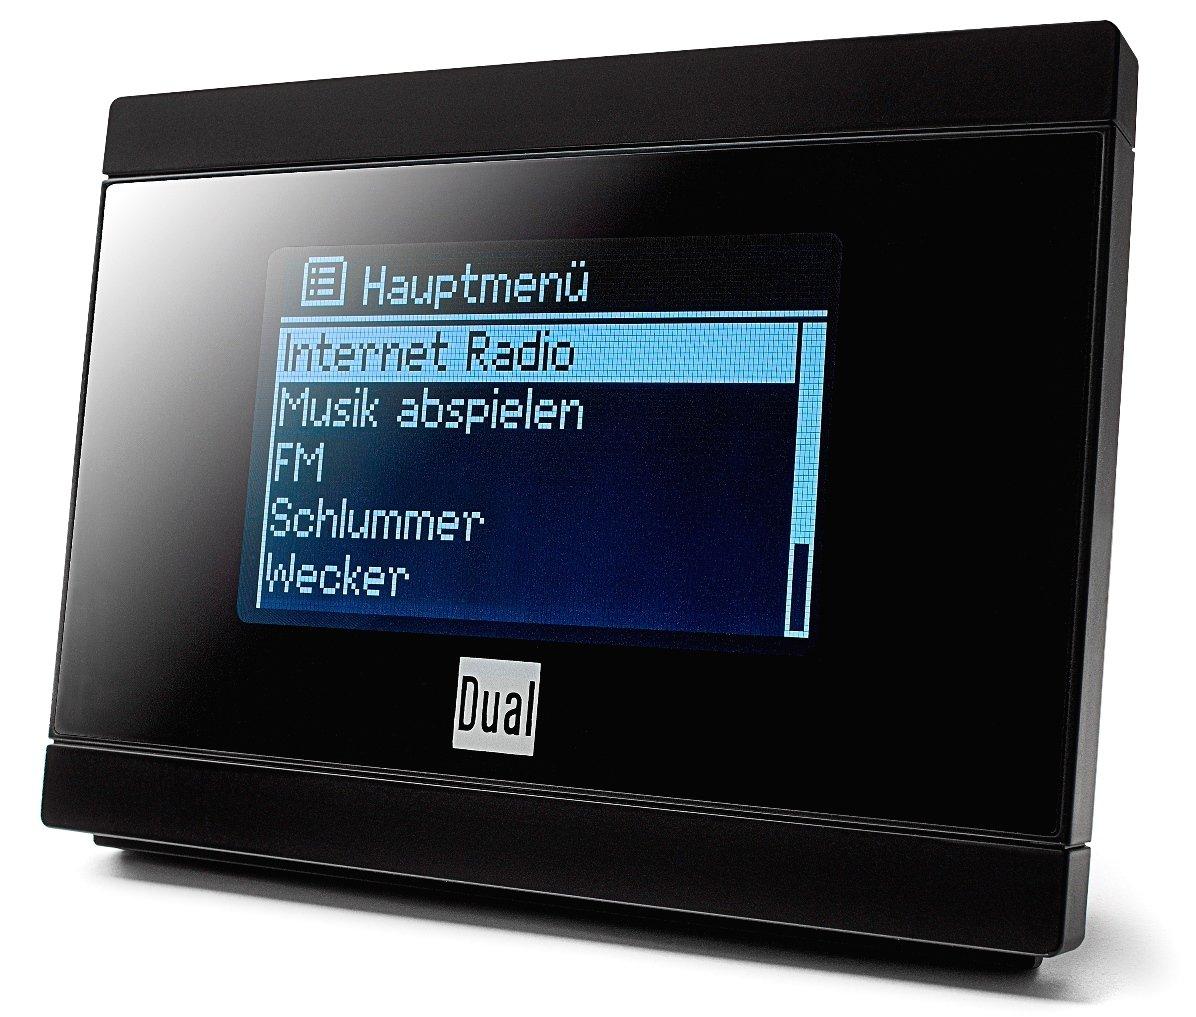 aa116 dual ir 2a internetradio adapter f r stereoanlage ukw upnp wifi ebay. Black Bedroom Furniture Sets. Home Design Ideas